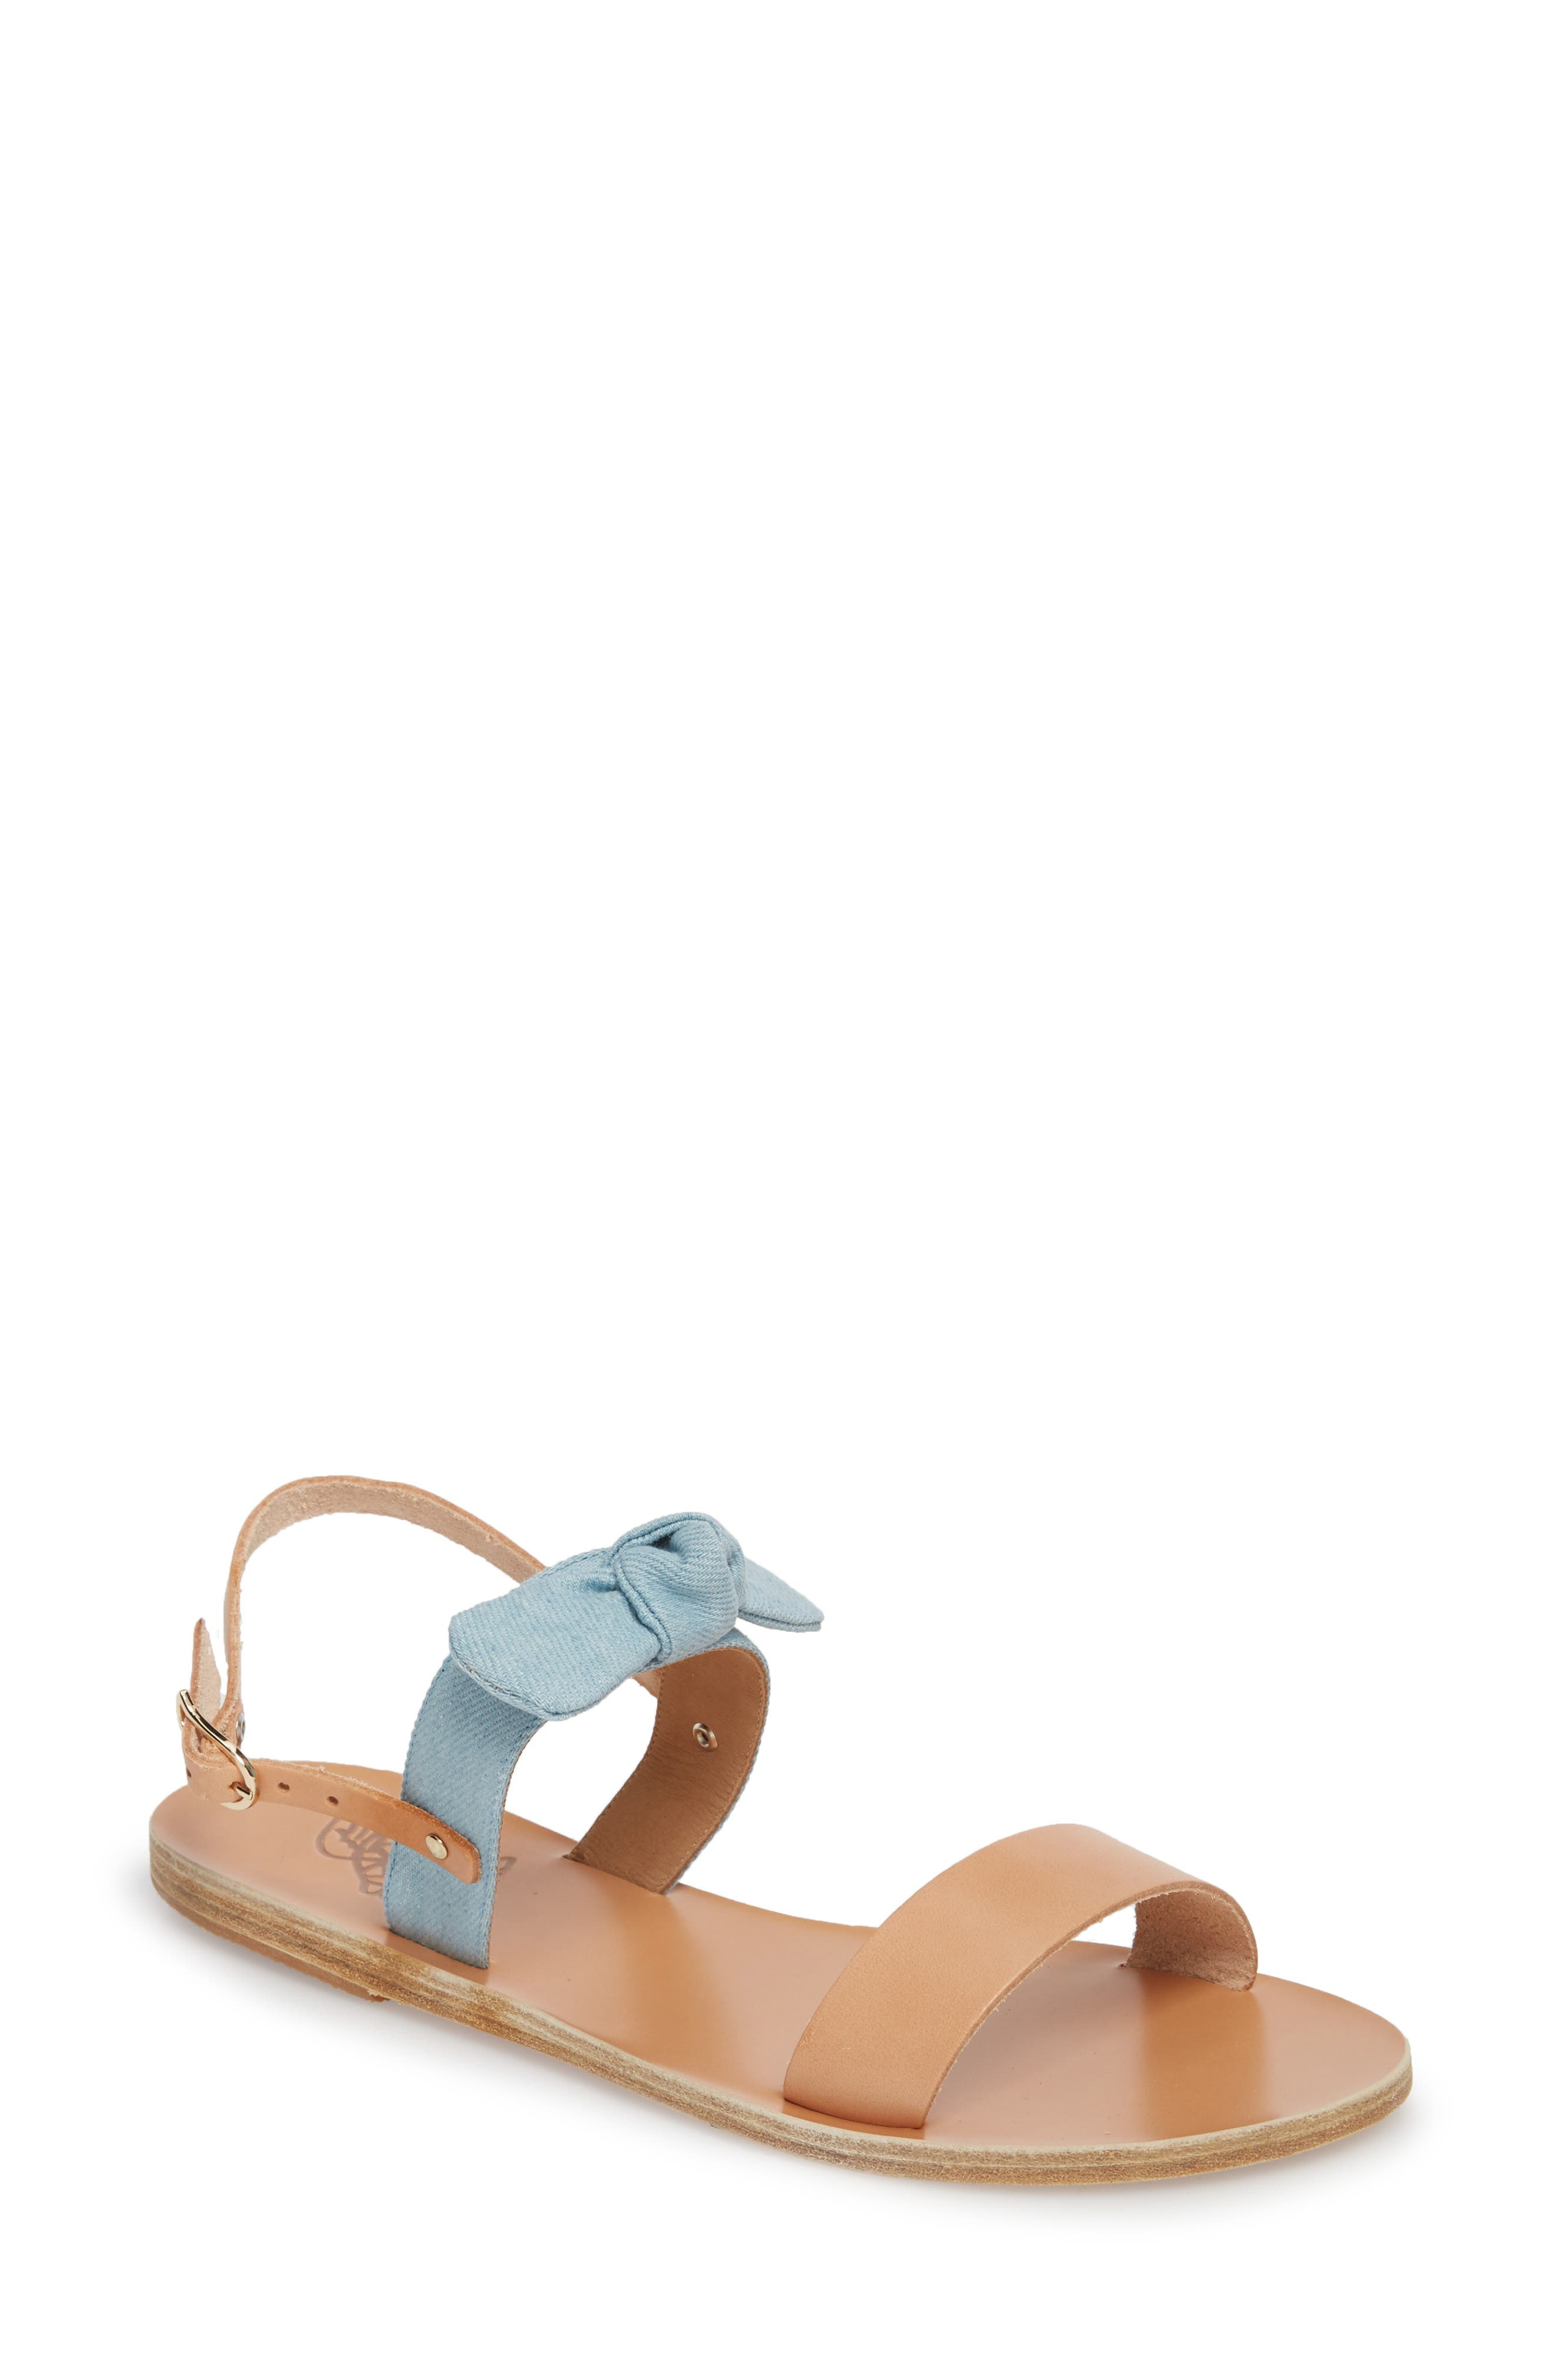 Clio Bow Sandal,                             Main thumbnail 1, color,                             400